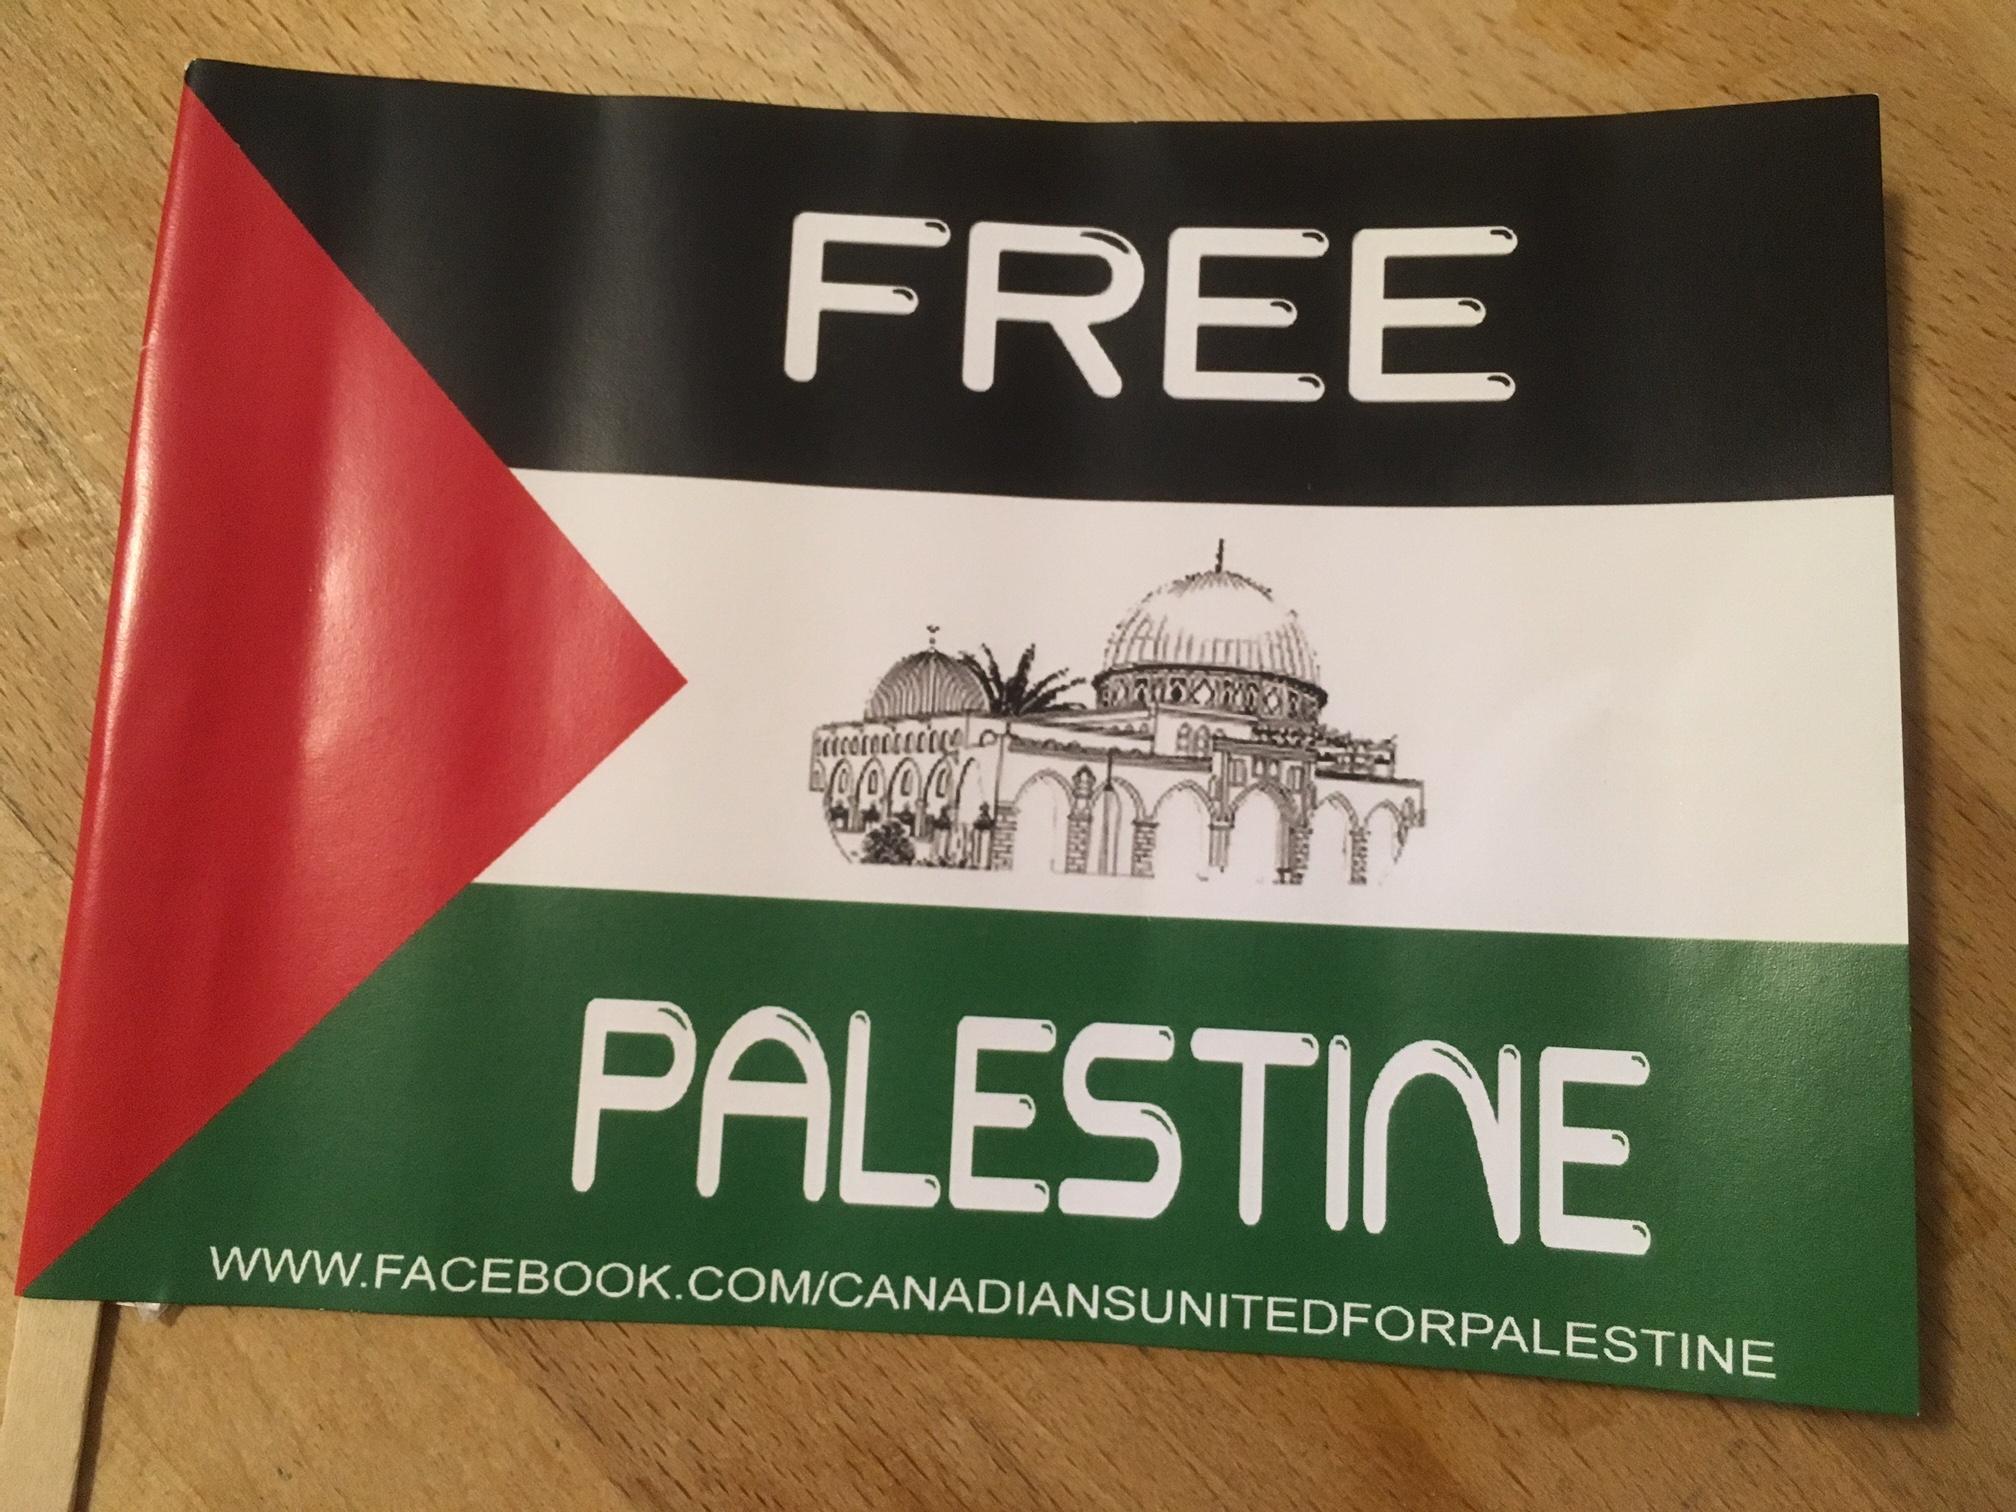 Free Palestine Flag.JPG